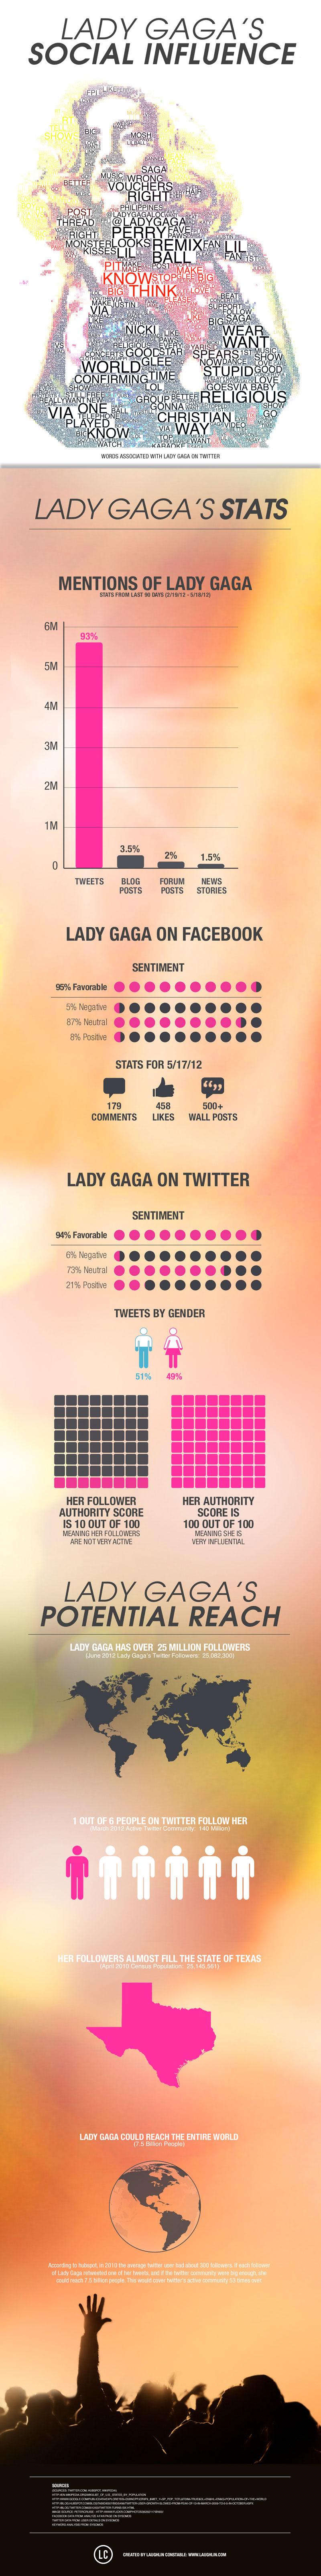 Lady Gaga Social Stats-infographic